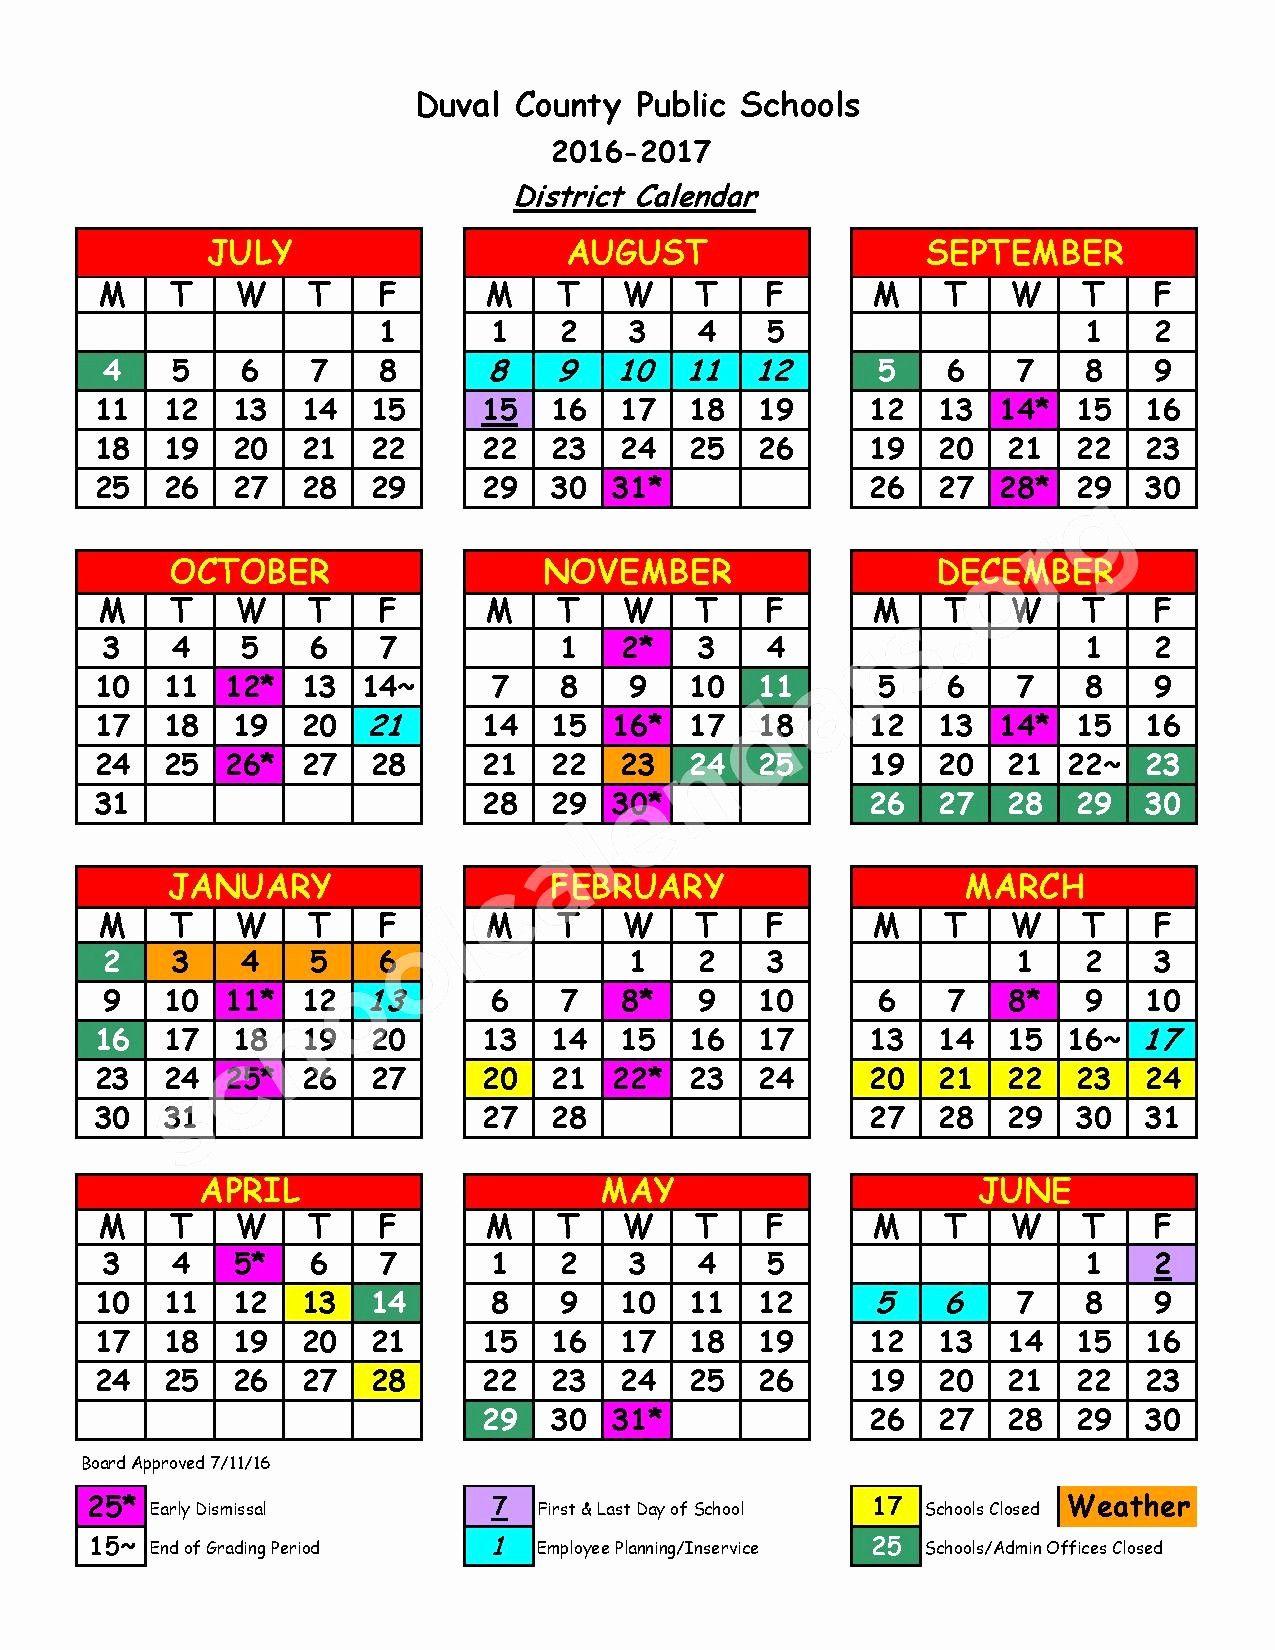 Huntsville City Schools Calendar 2022.50 Baltimore County Public Schools Calendar Dr0x School Calendar Duval County Homeschool Calendar